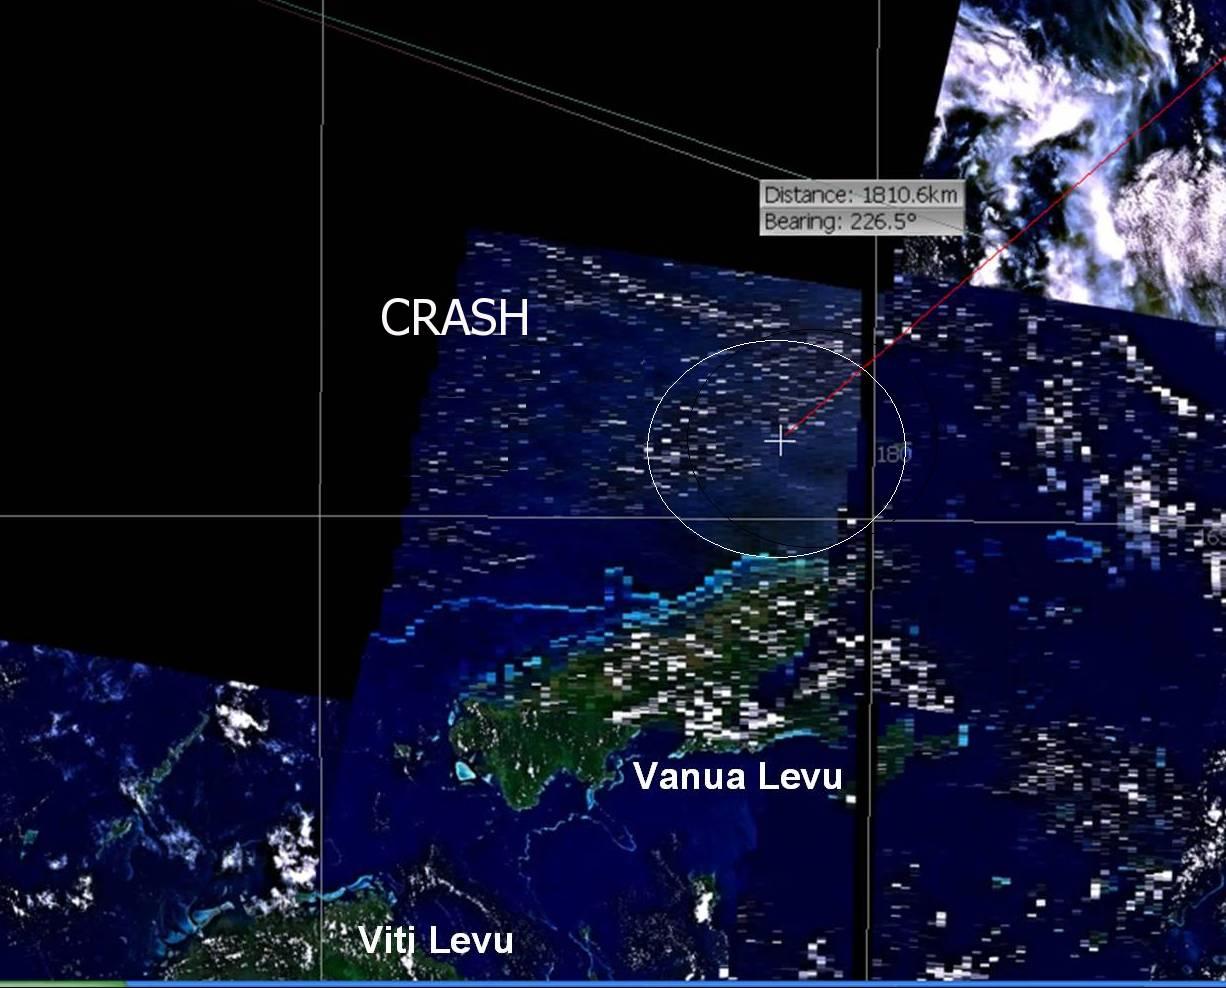 Archivo:Oceanic 815 Poss Crash area.jpg